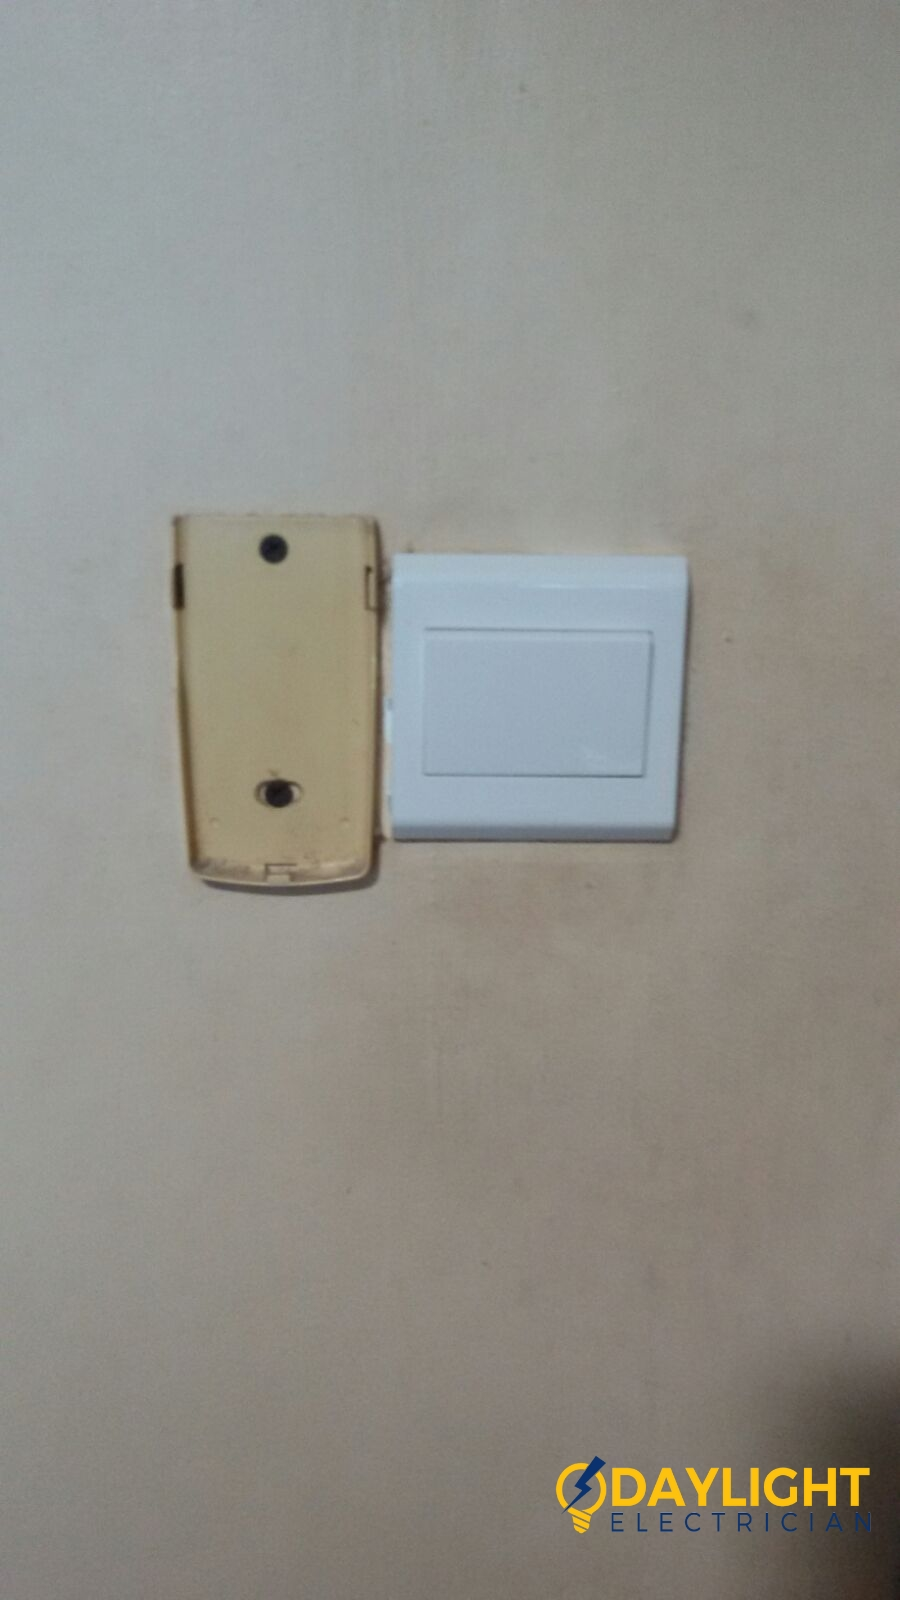 replace-light-switch-electrician-singapore-bedok-hdb-4